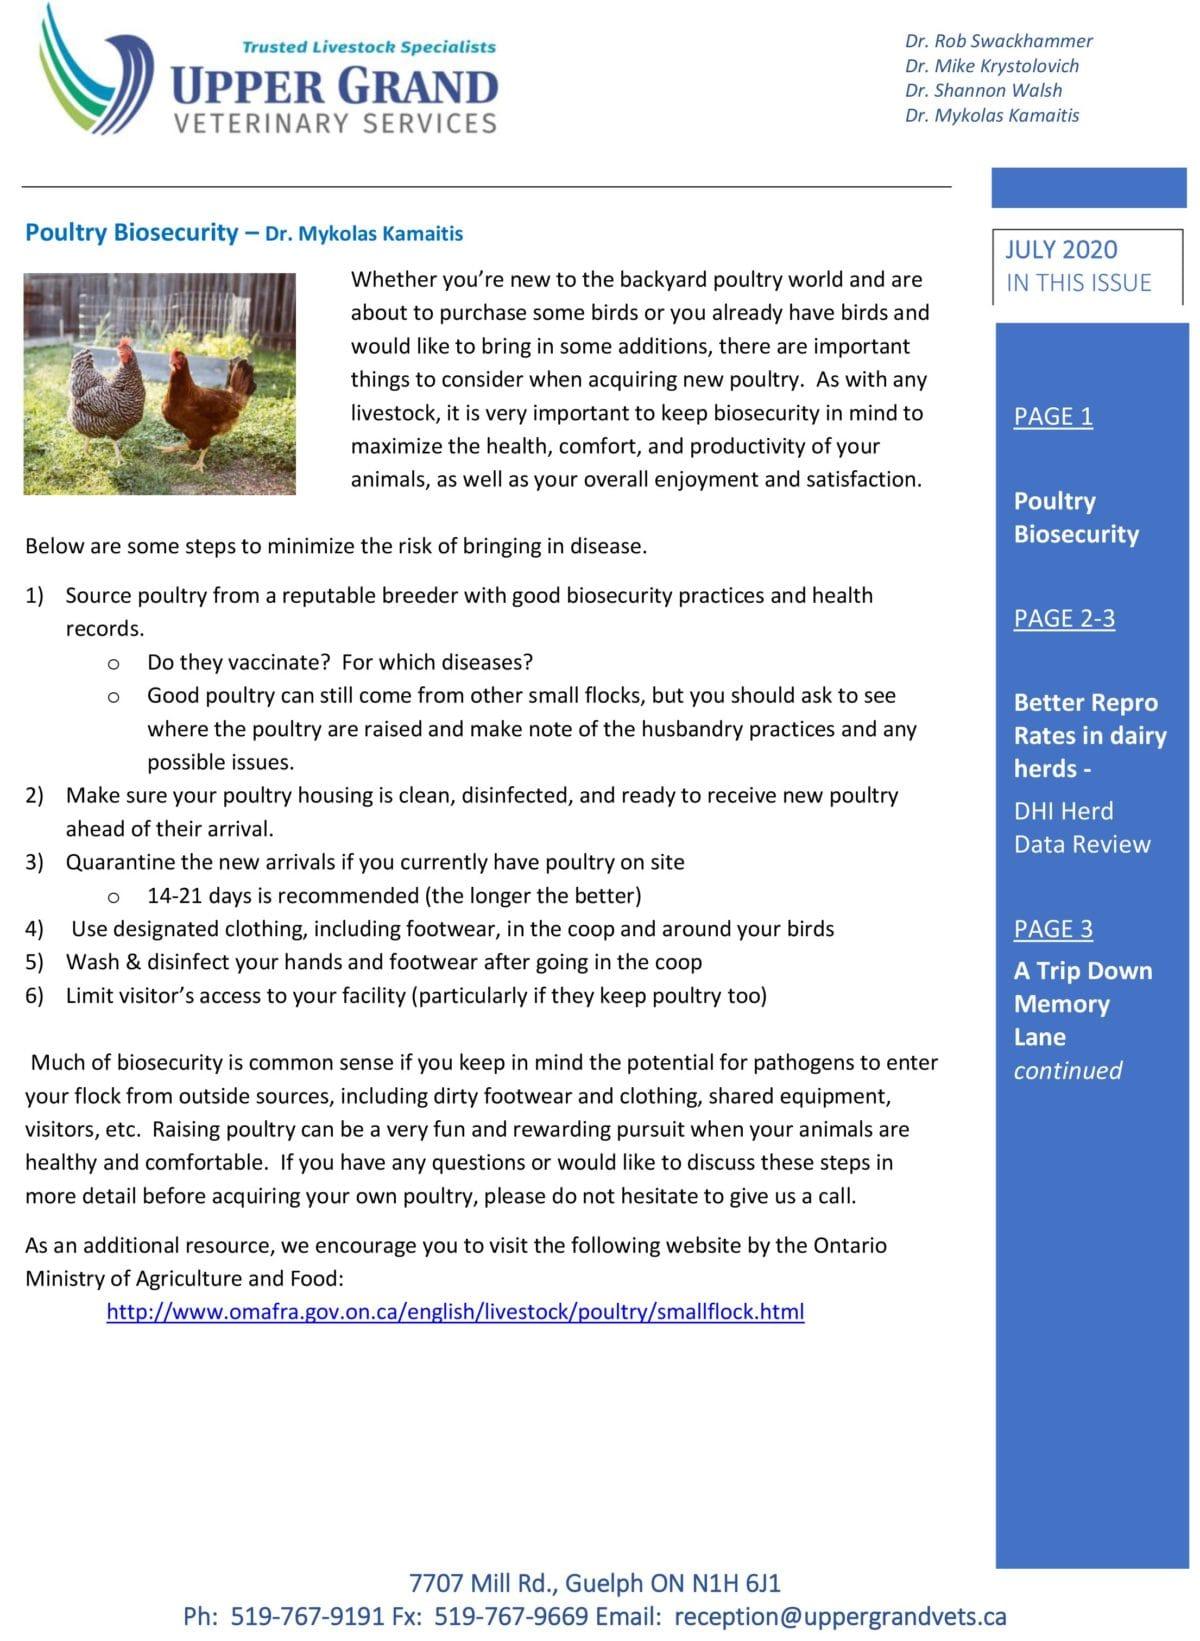 UGVS-Newsletter_07-2020-1-copy-1200x1641.jpg